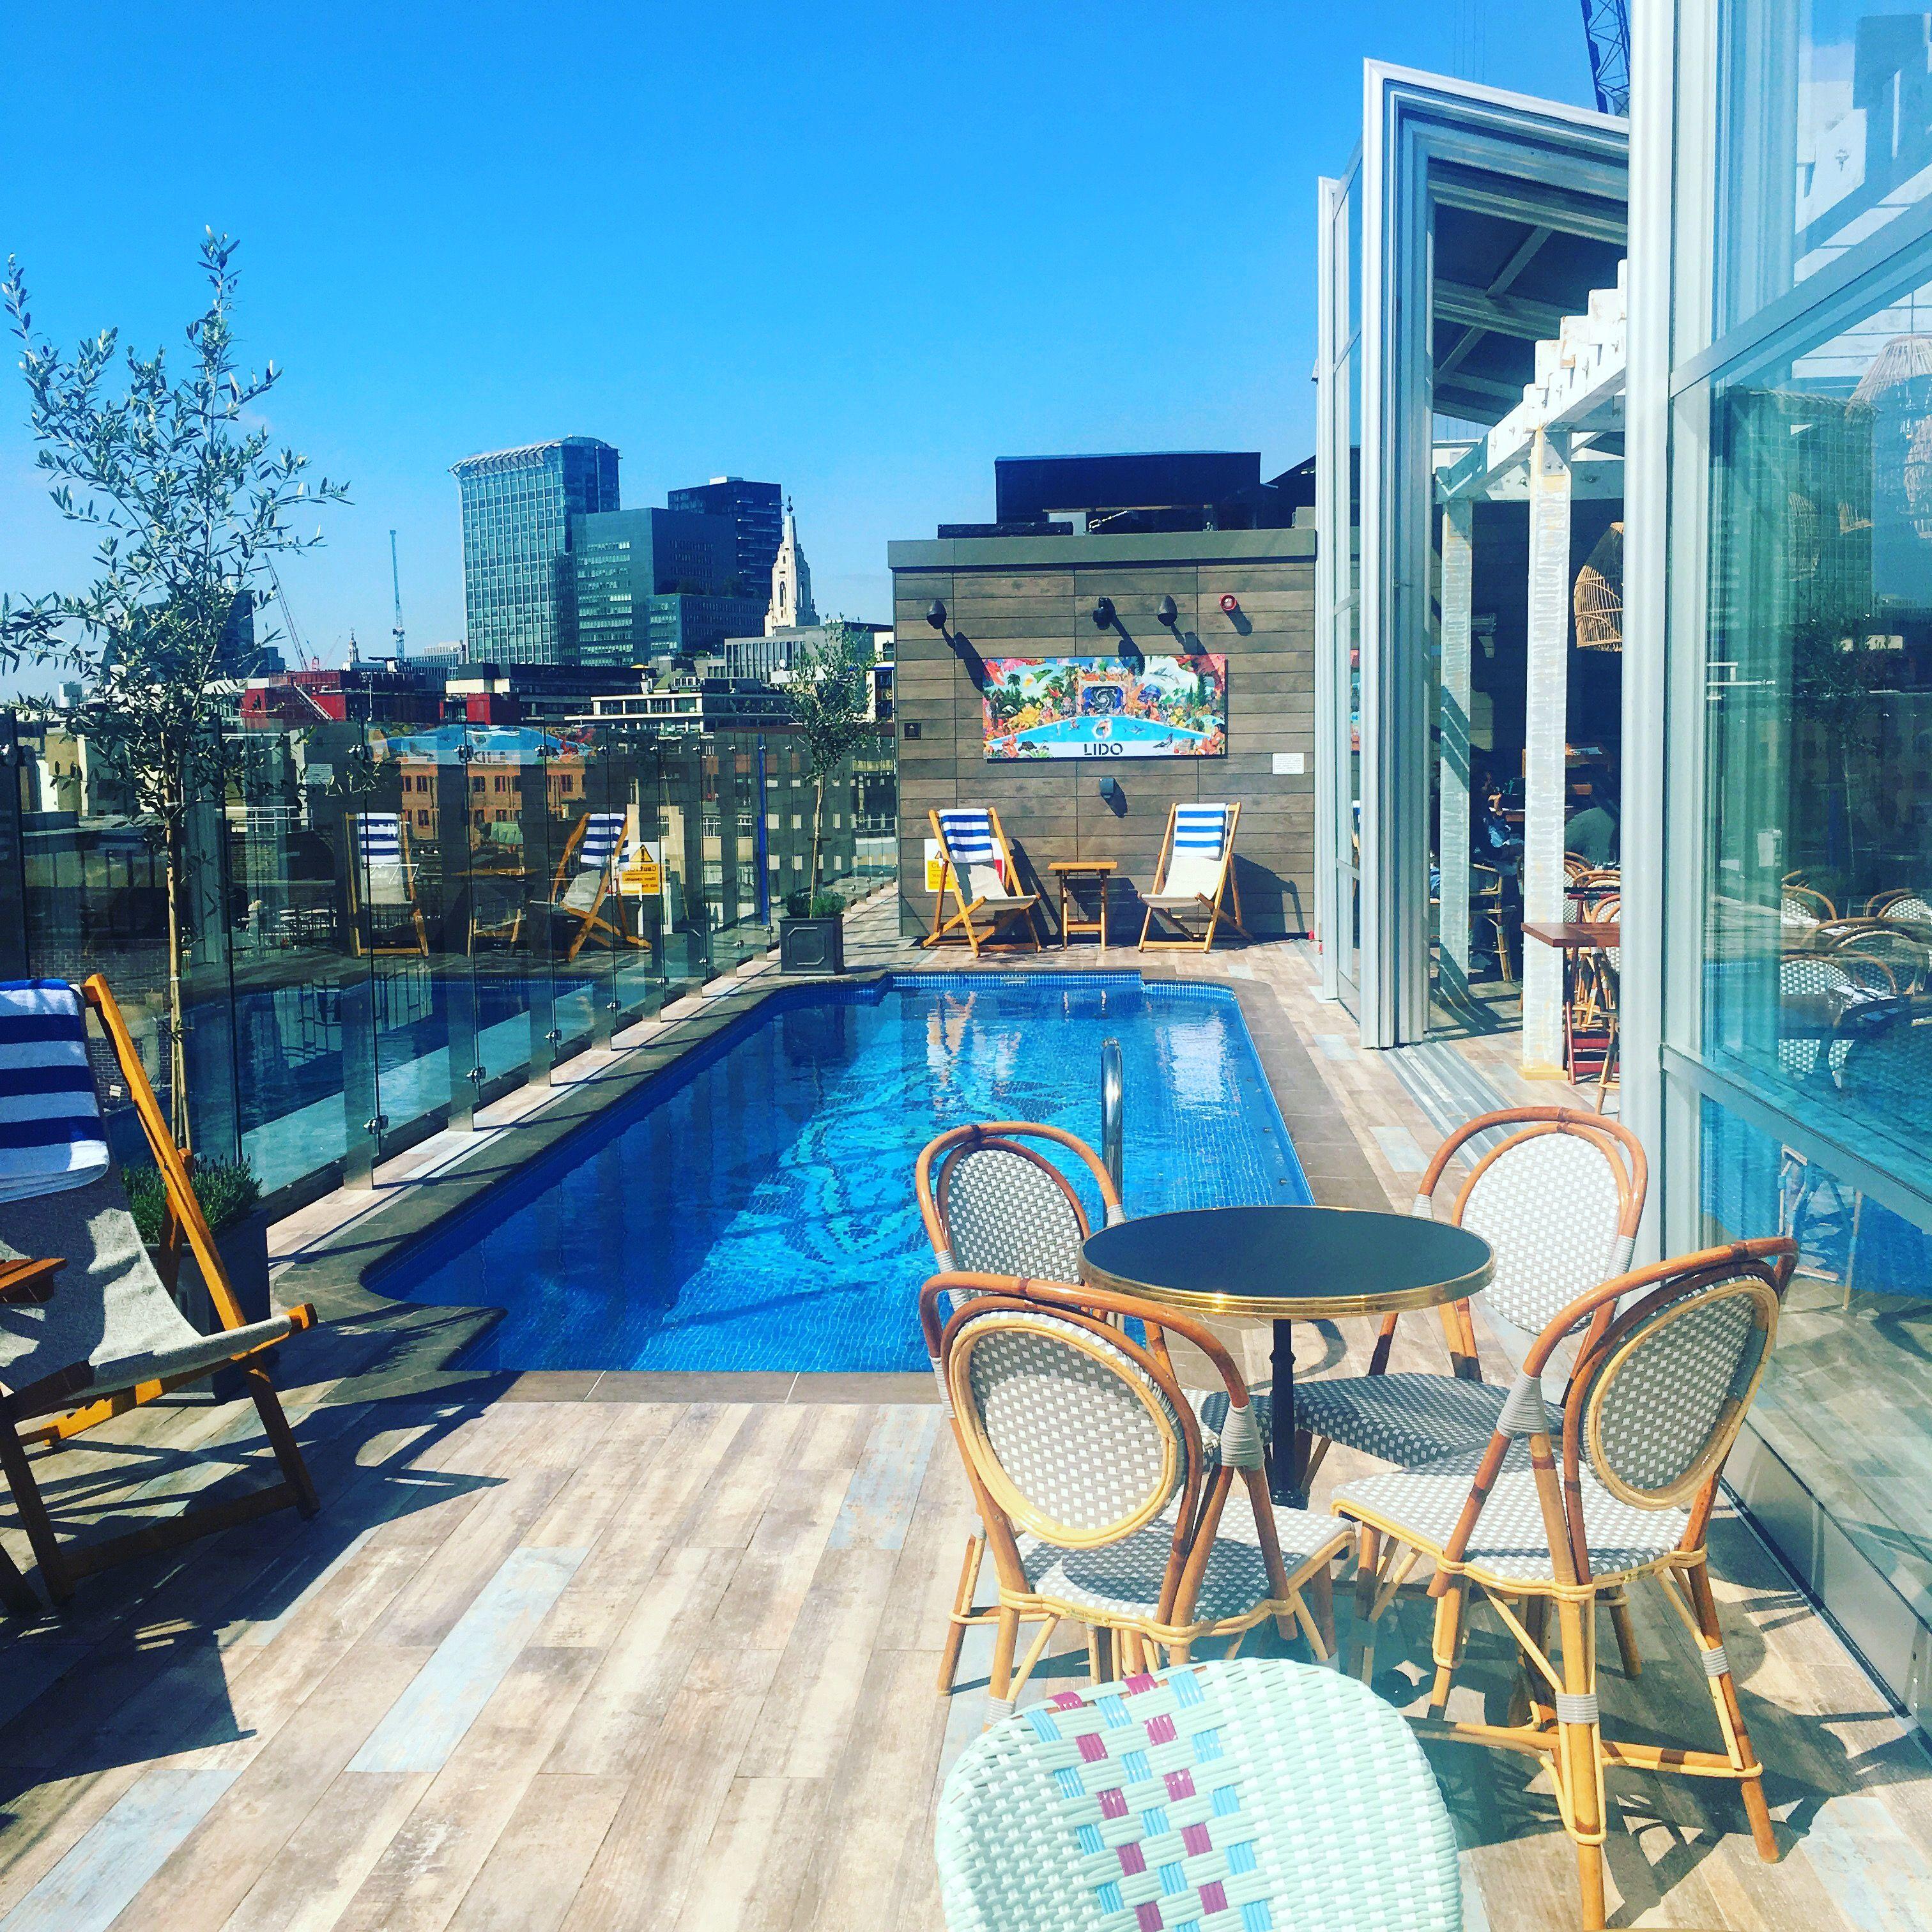 Lido The Curtain Hotel In London Via Whatyoufancy Instagram Lido Rooftop London